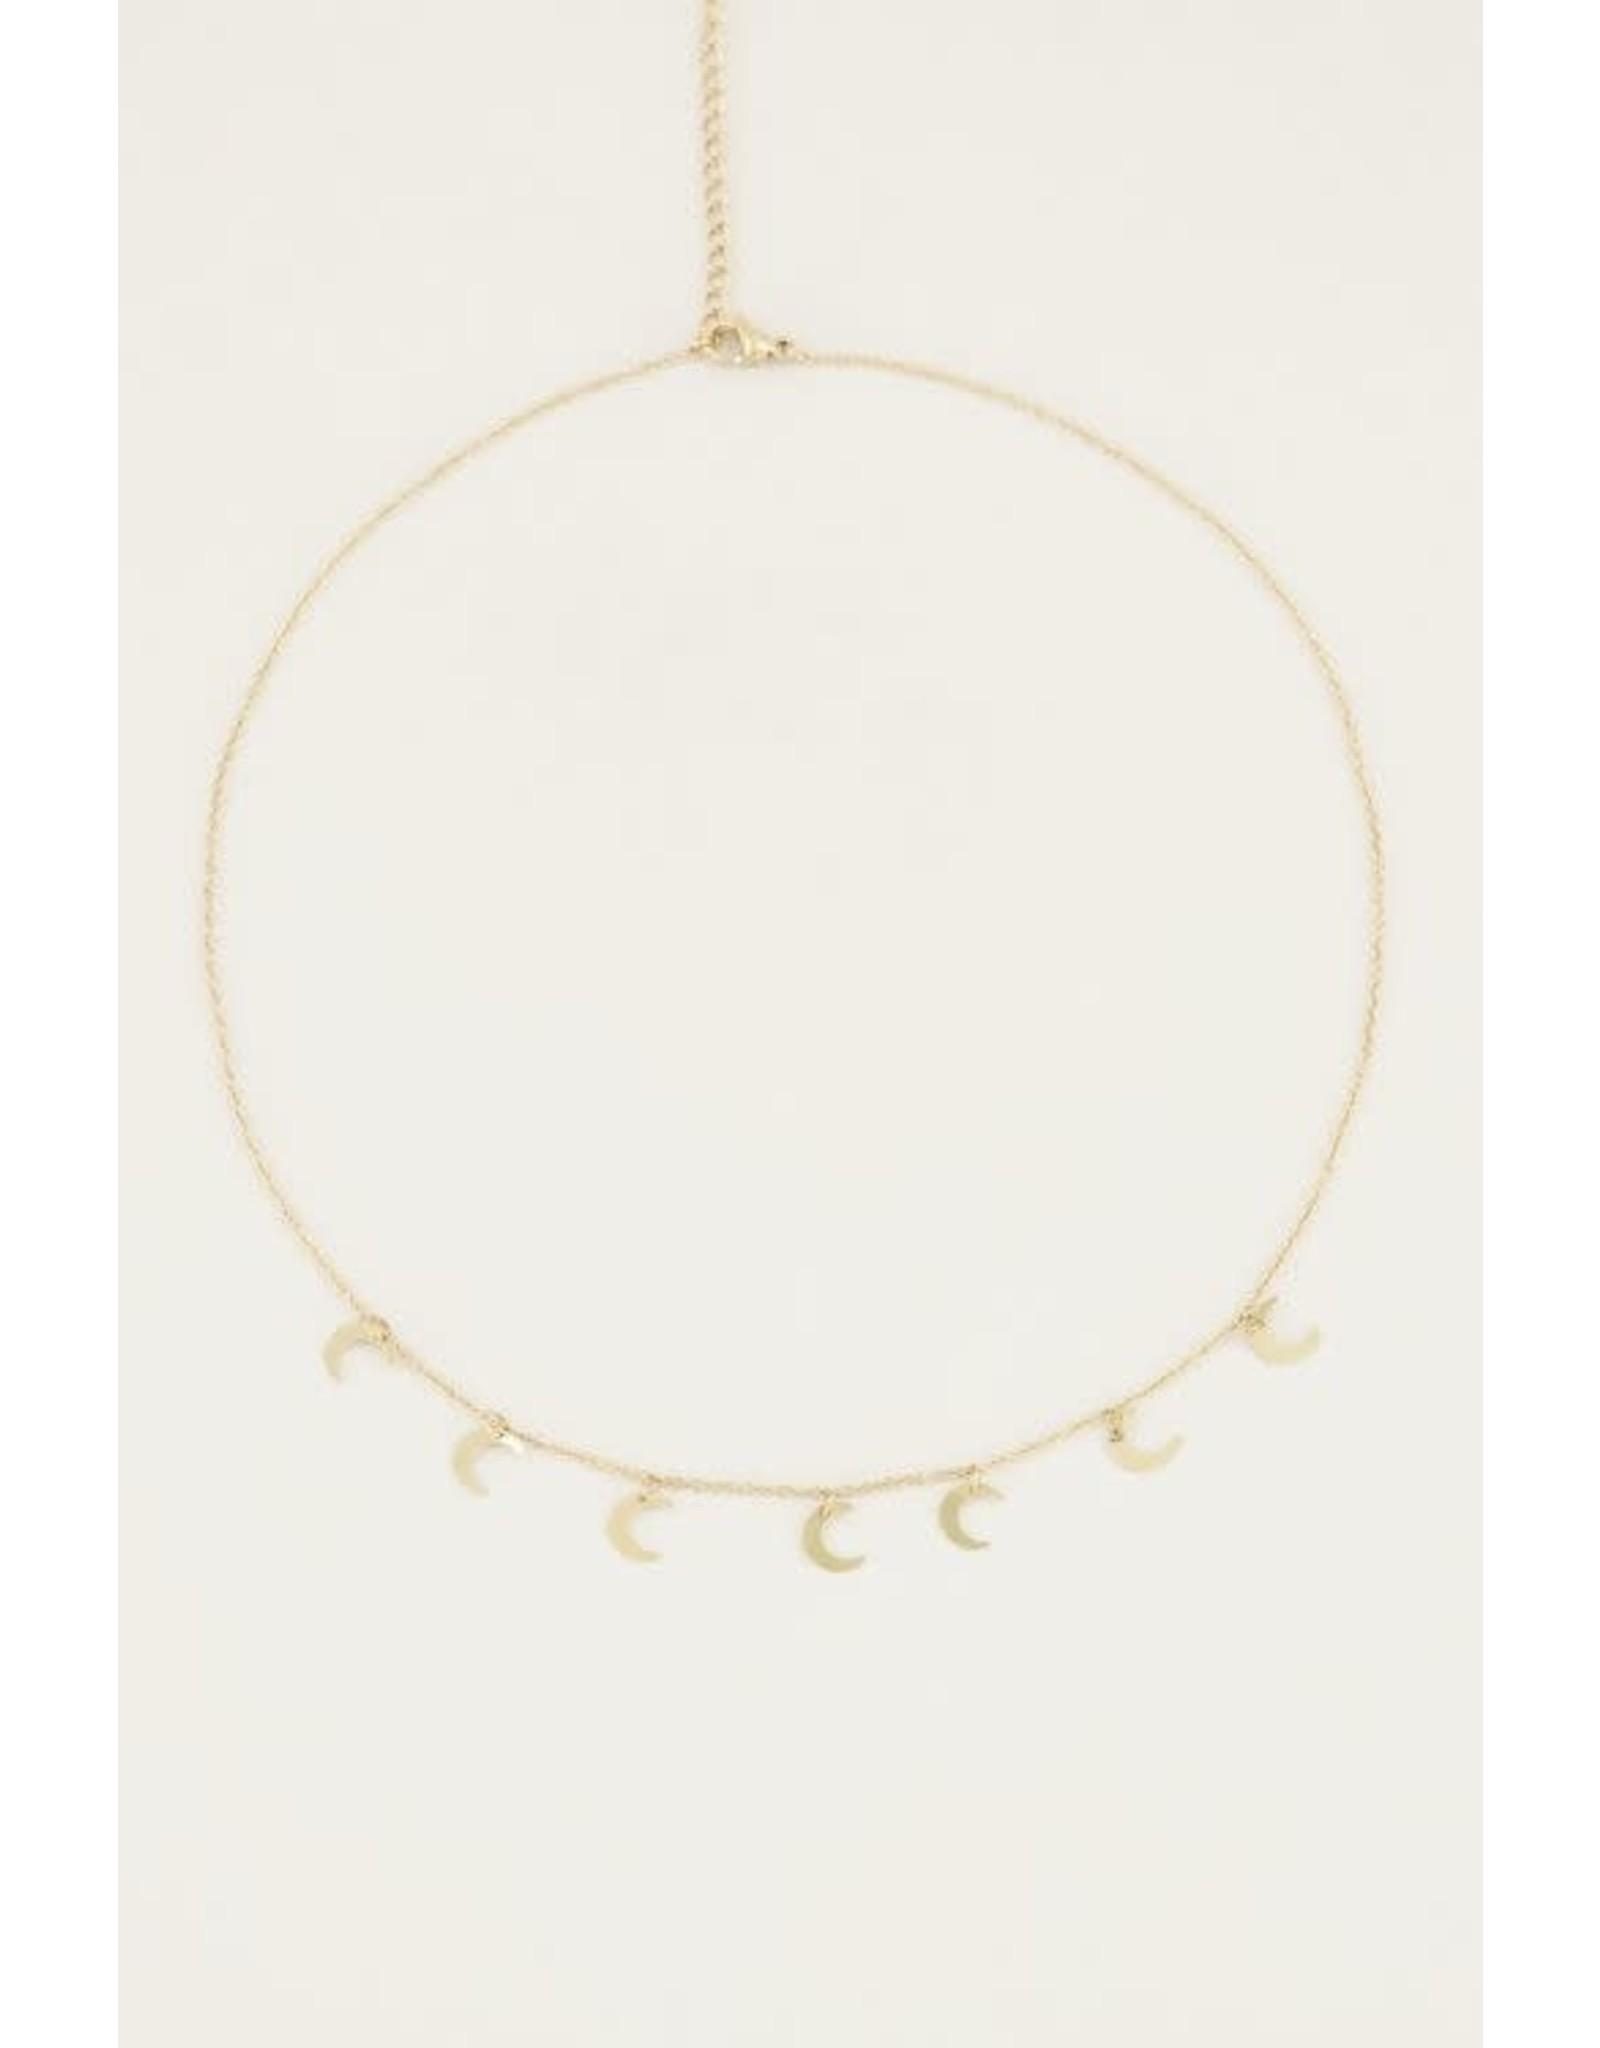 My Jewellery My Jewellery ketting maantjes